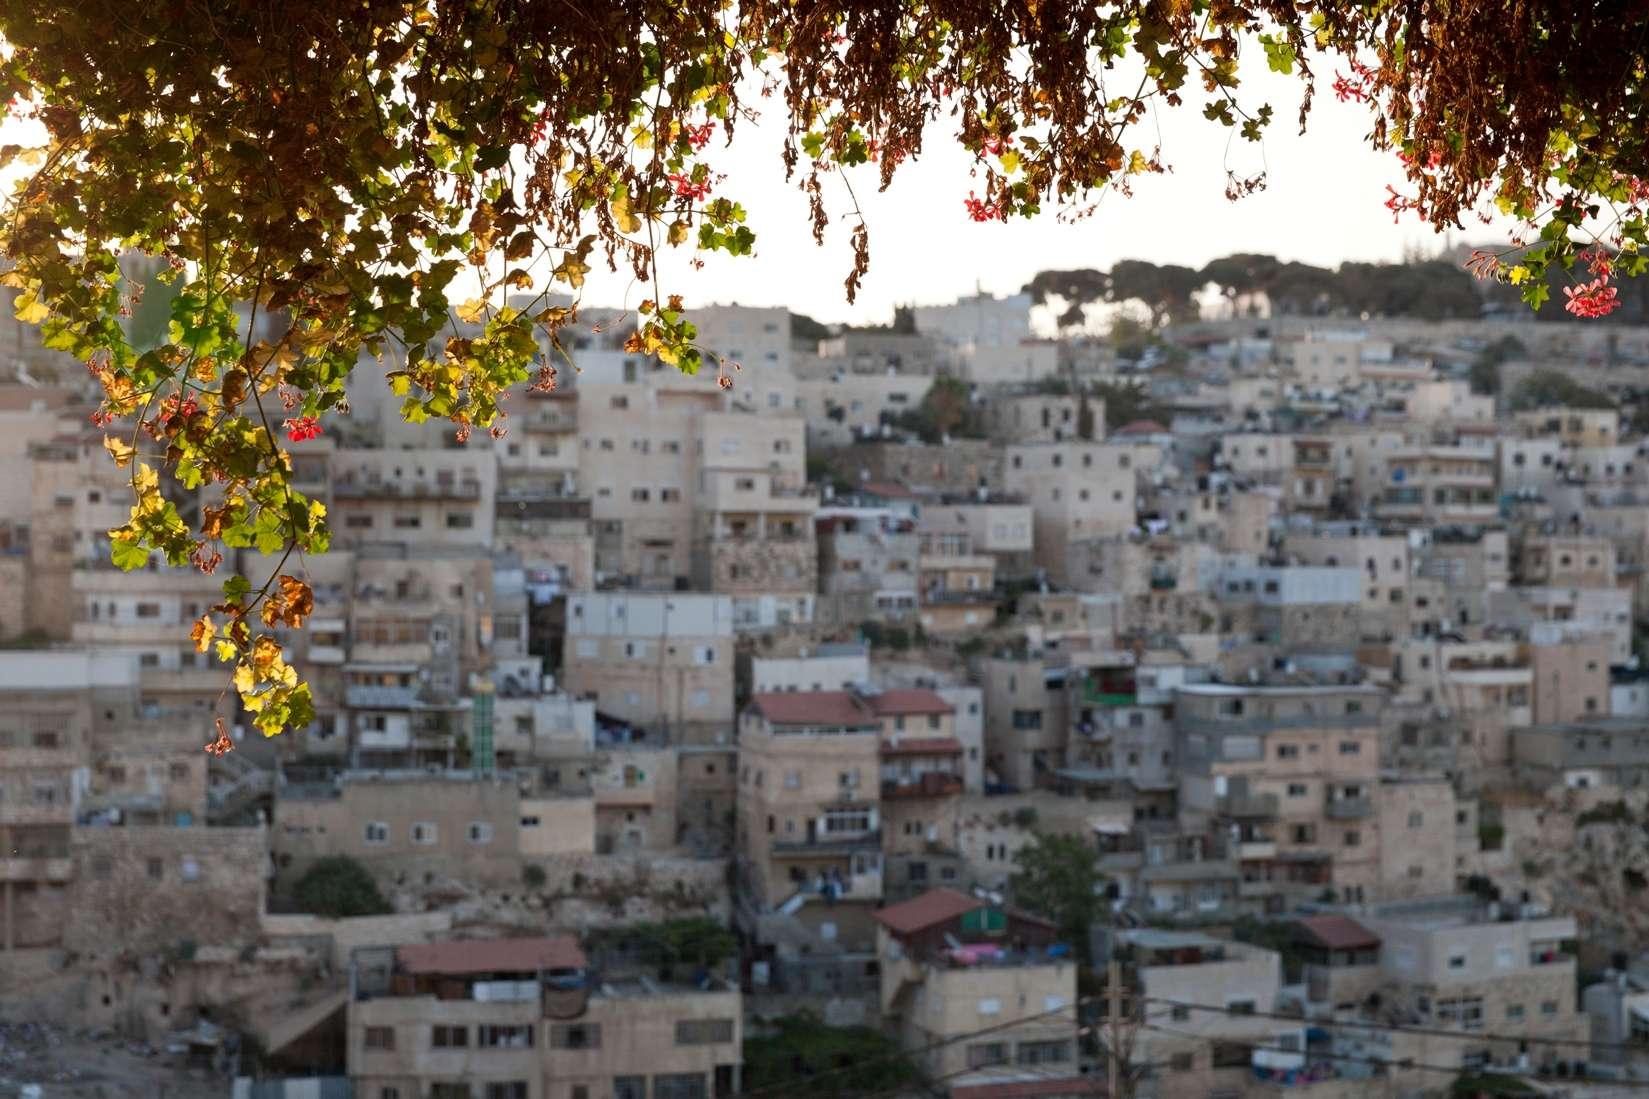 Silwan / City of David